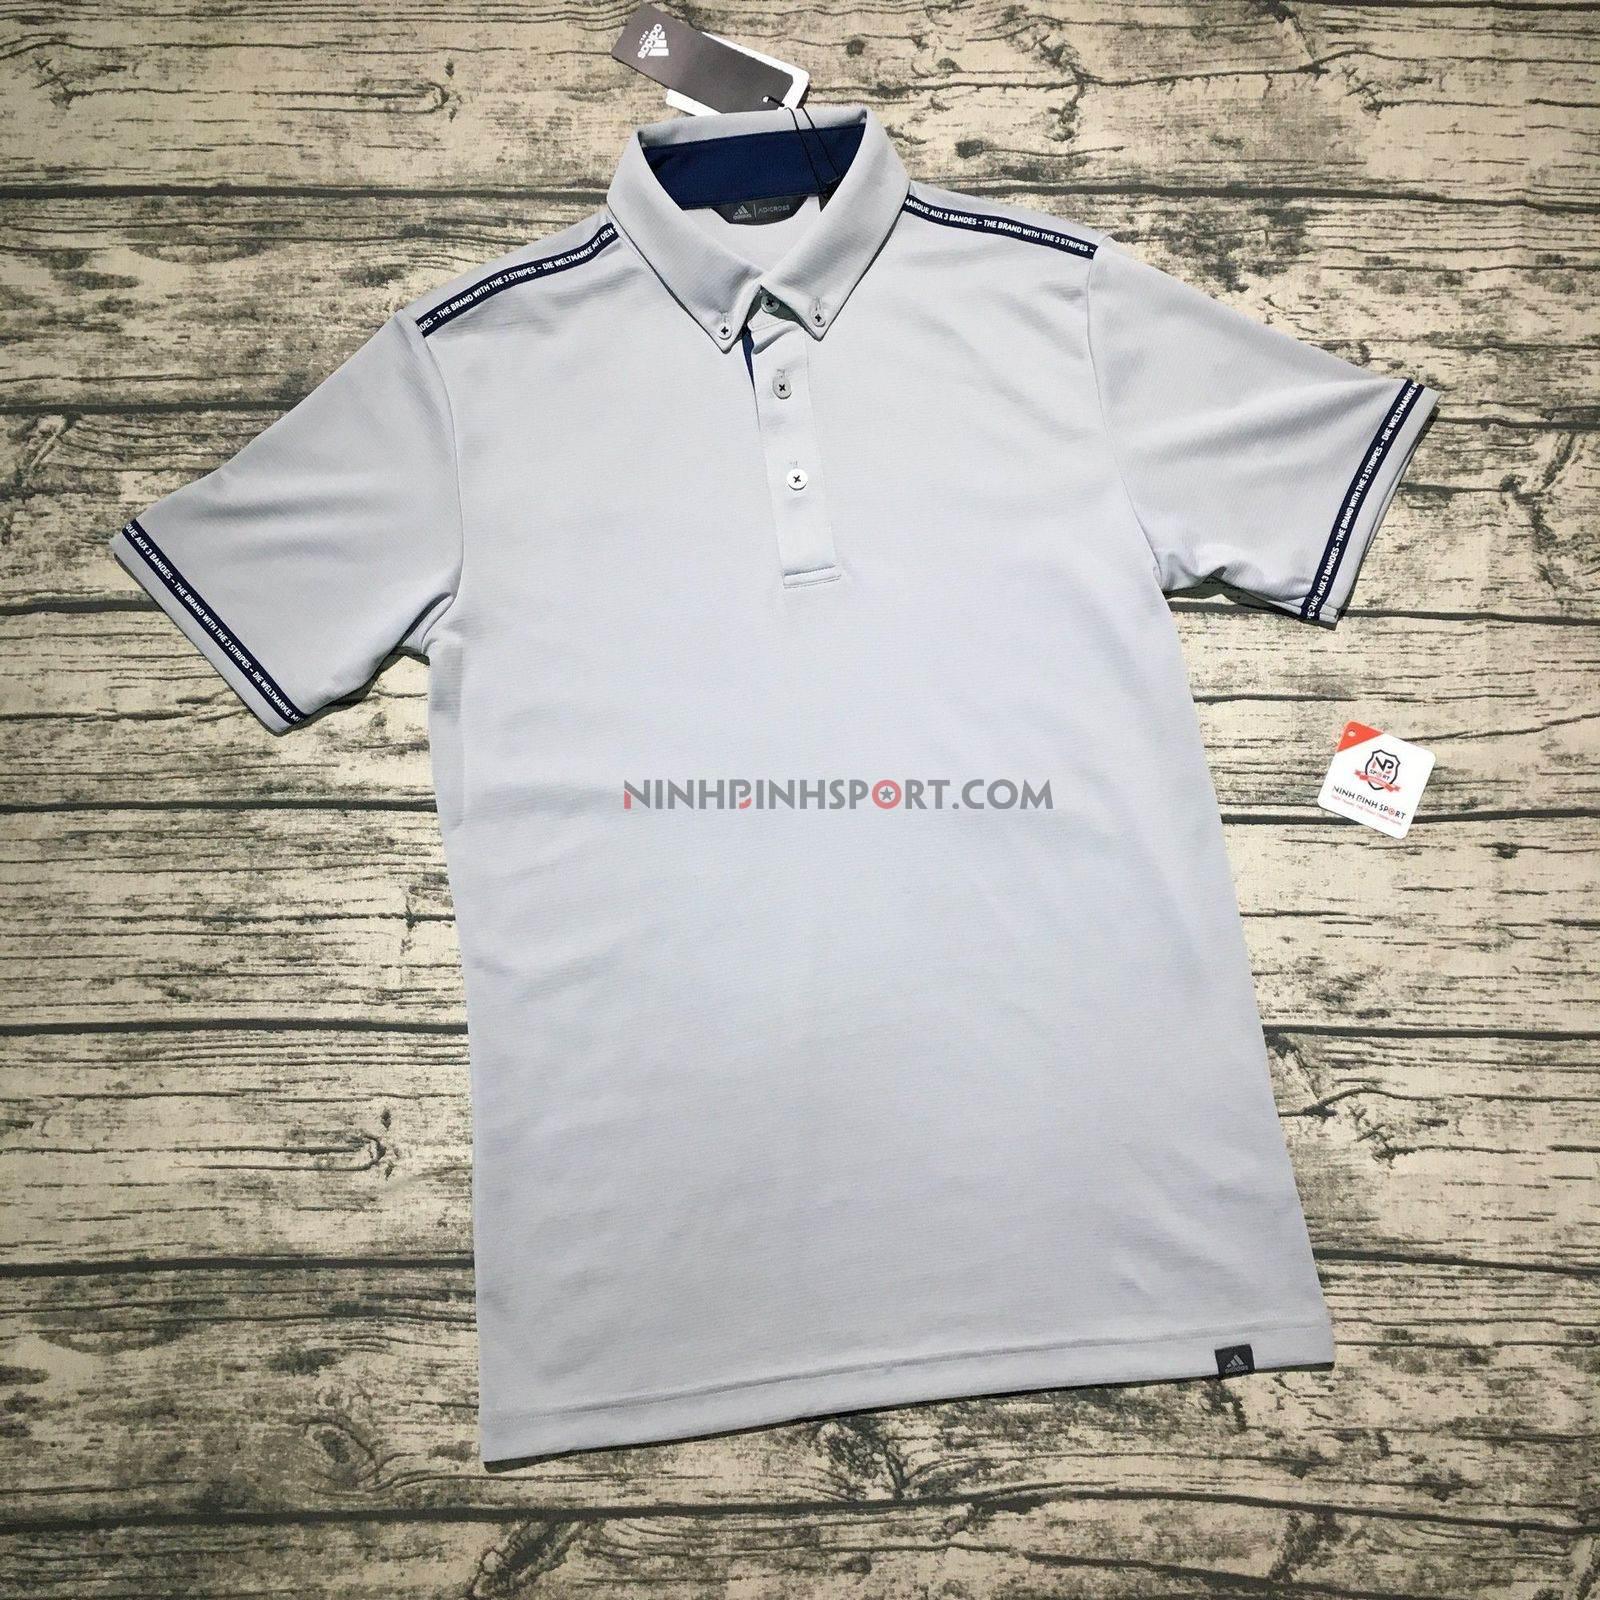 Áo thể thao nam Adidas Golf Adicross Polo  DW5799